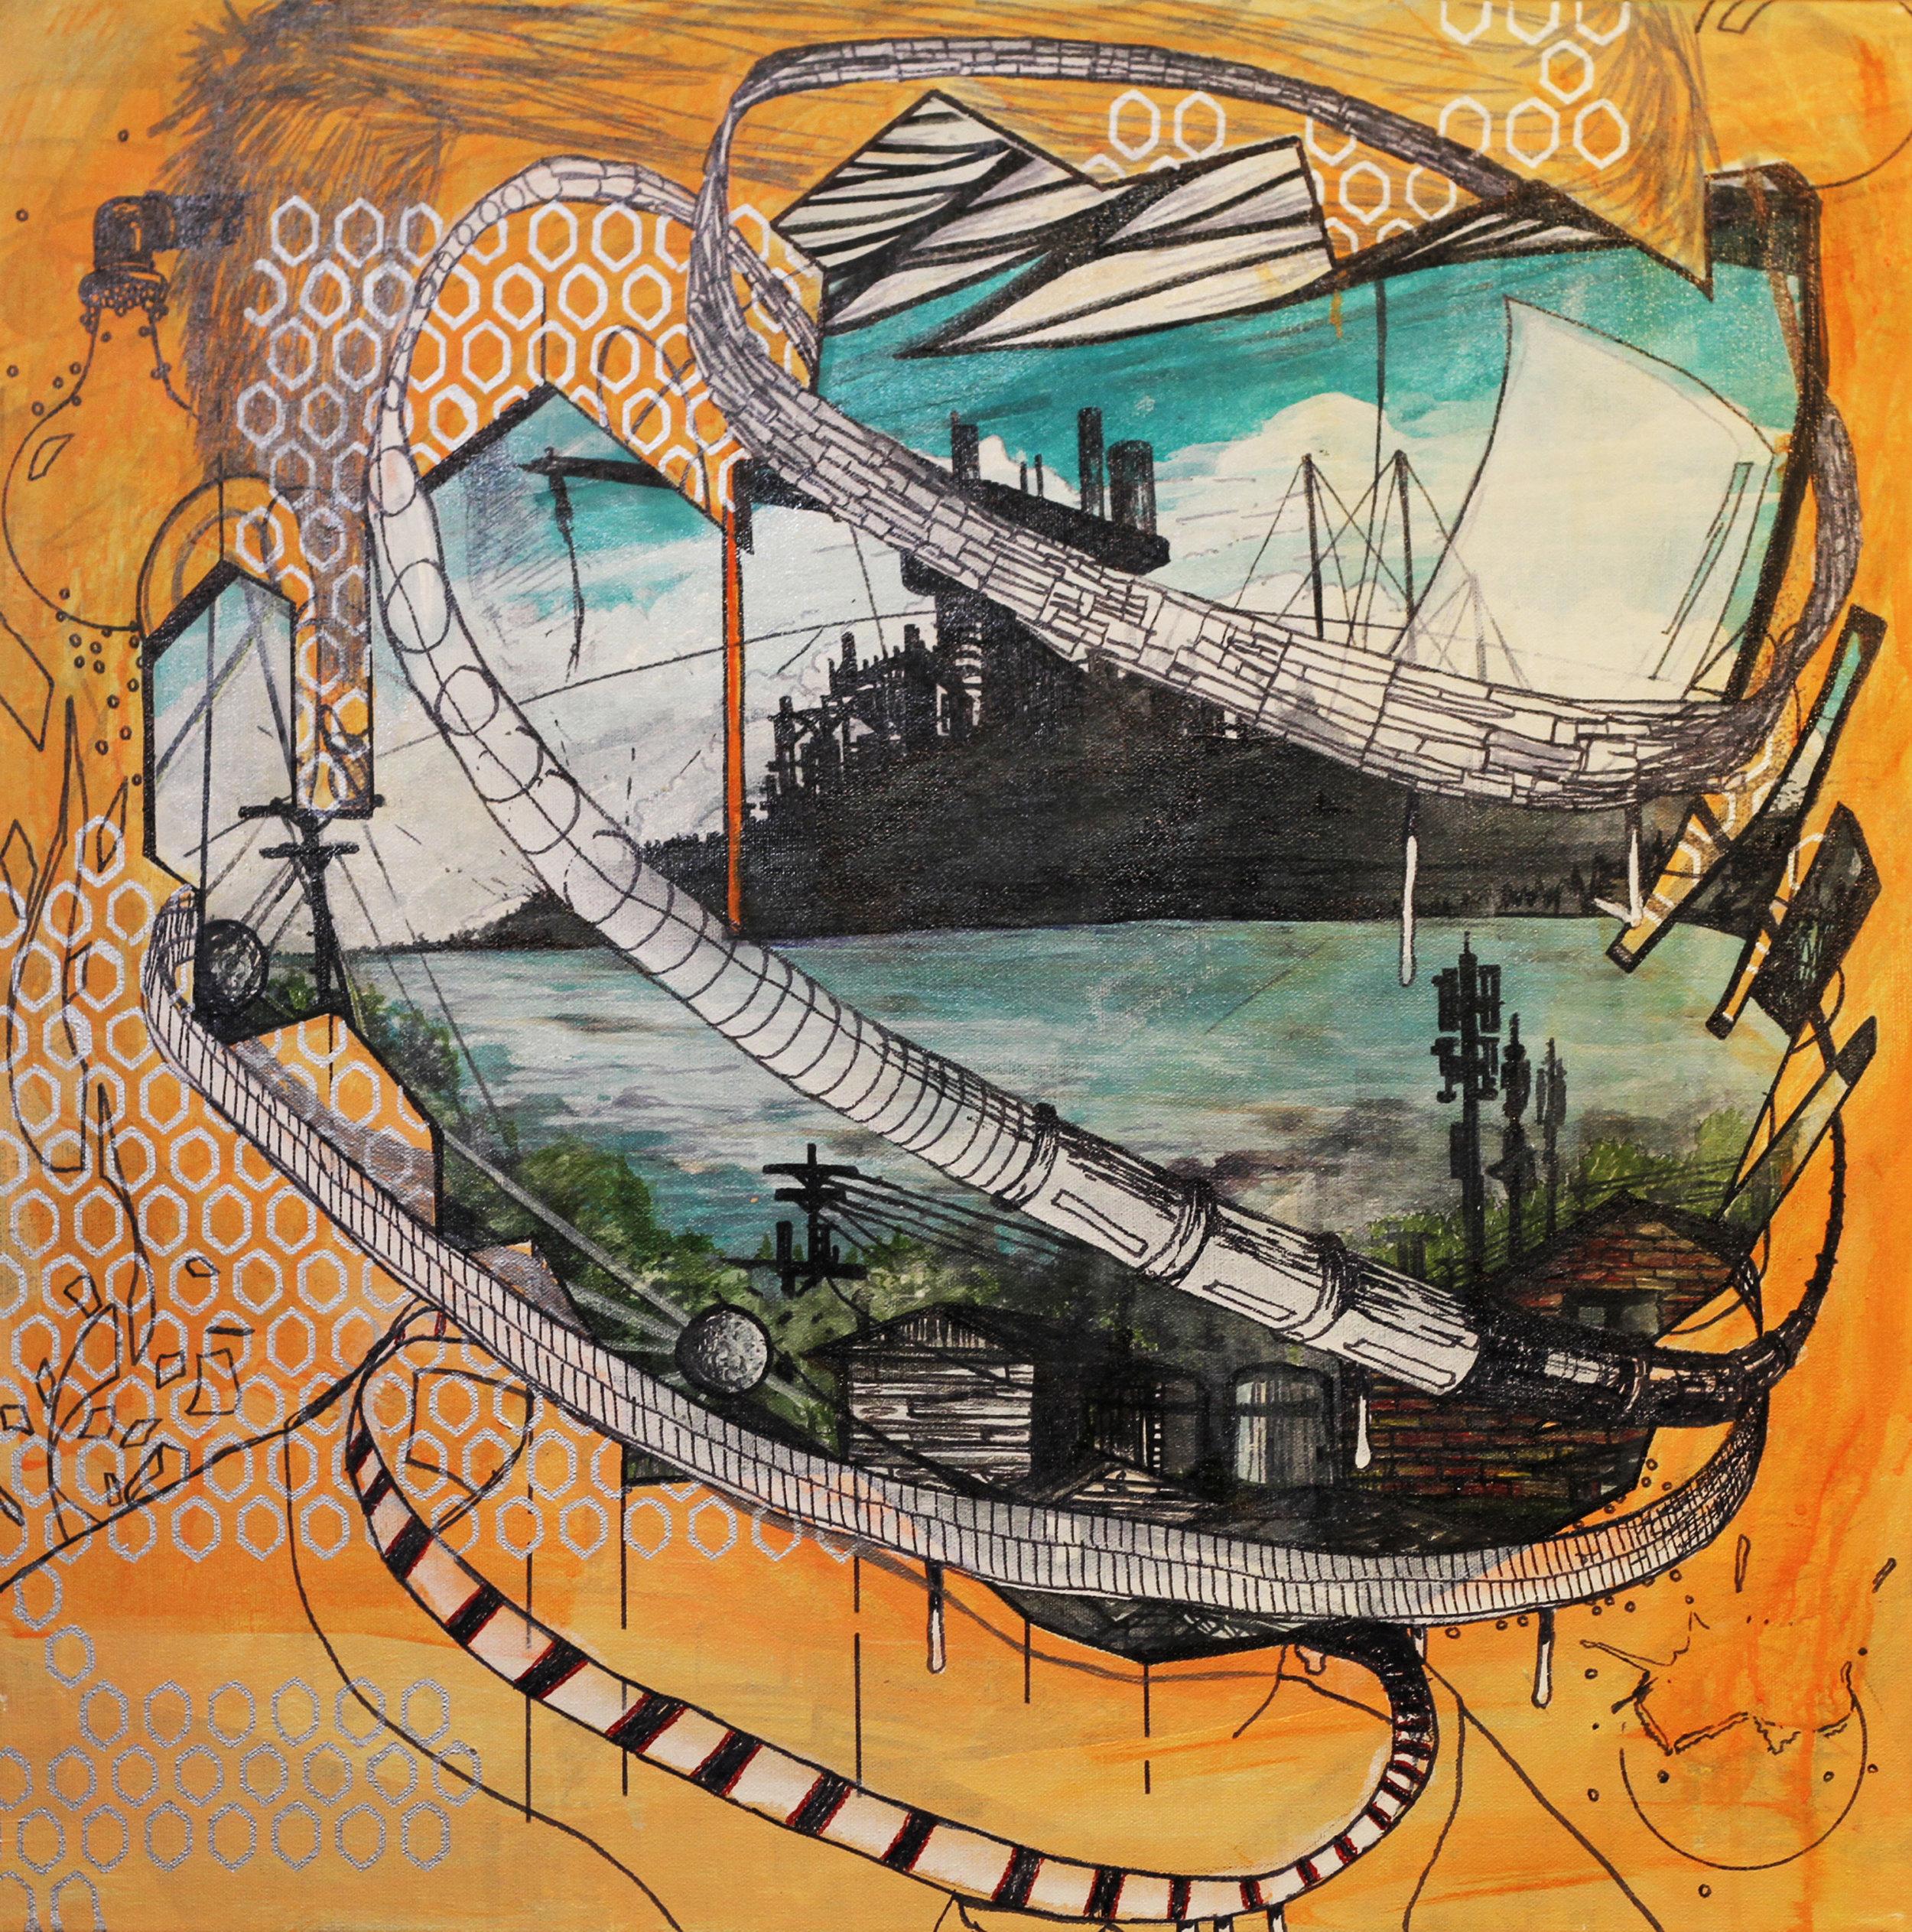 """Clopener"" by Jonathan Reinert | ISSUE FIVE"